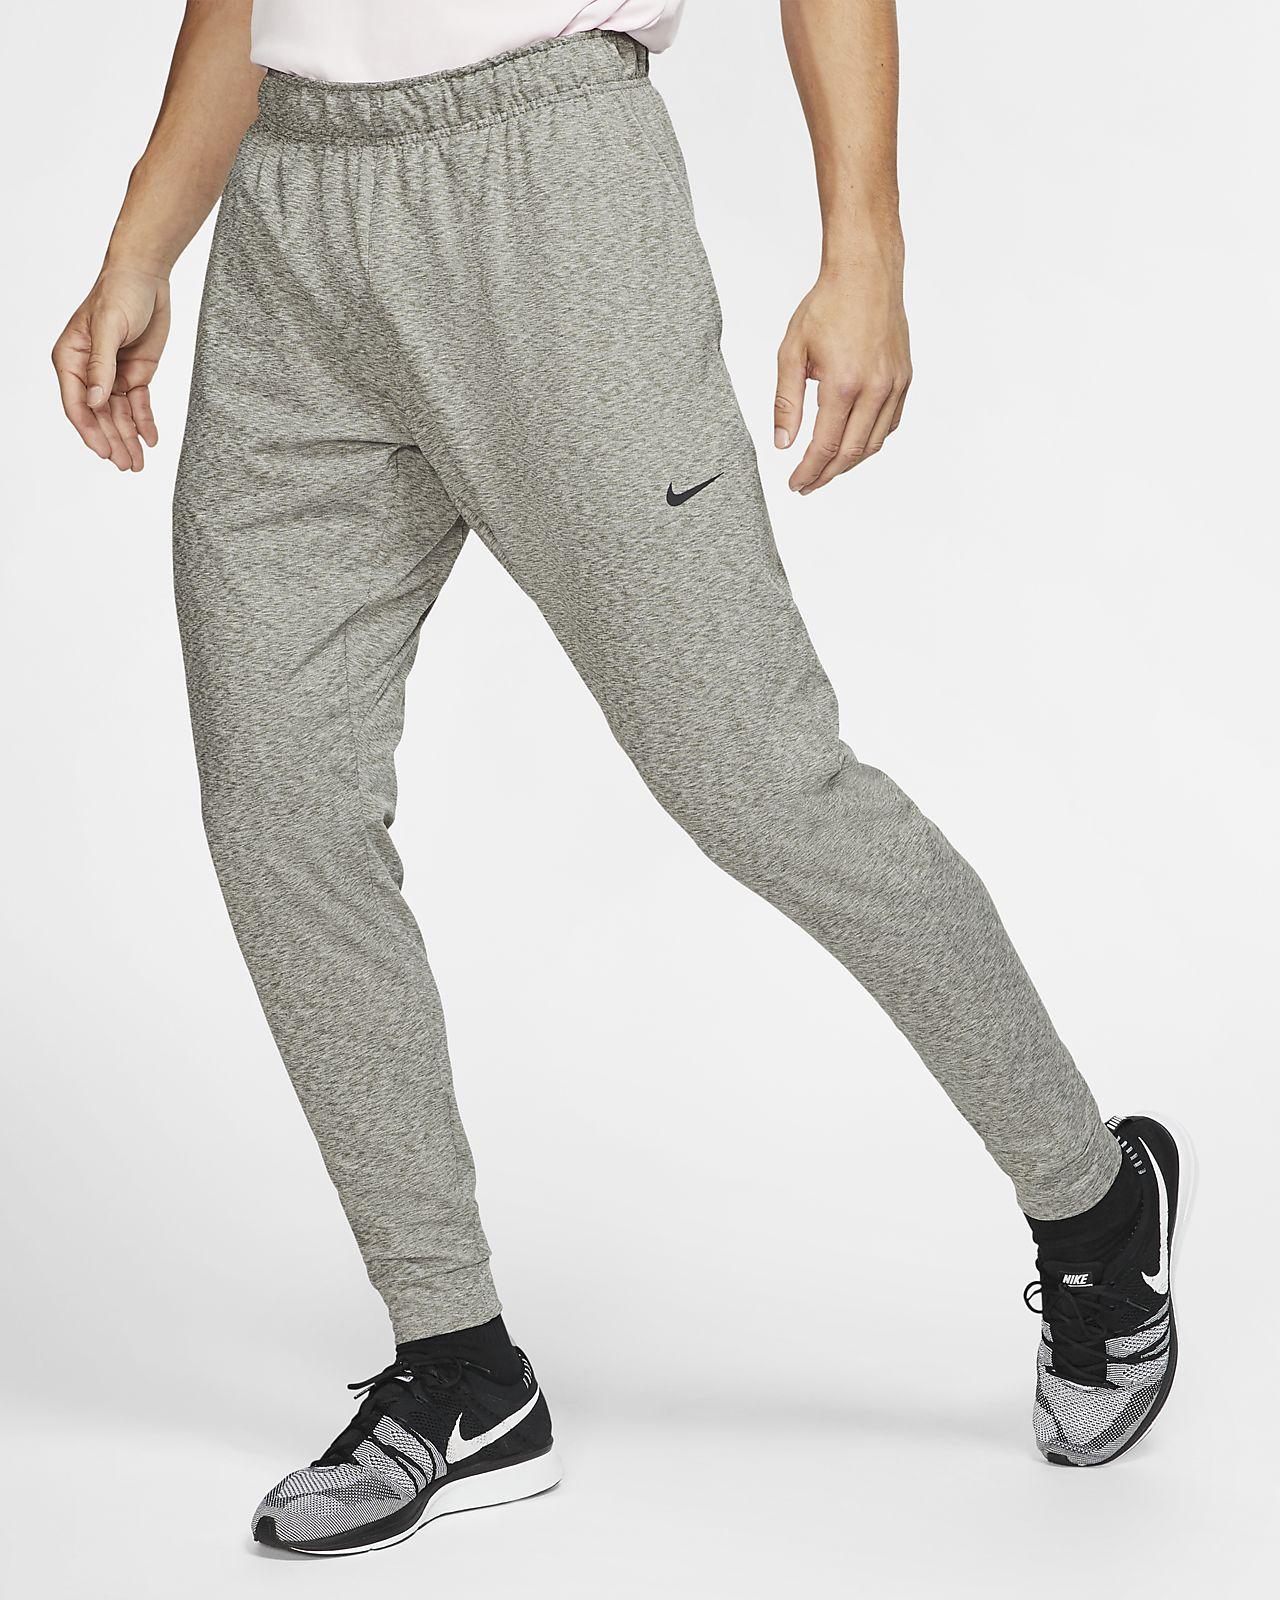 Мужские брюки для йоги Nike Dri-FIT